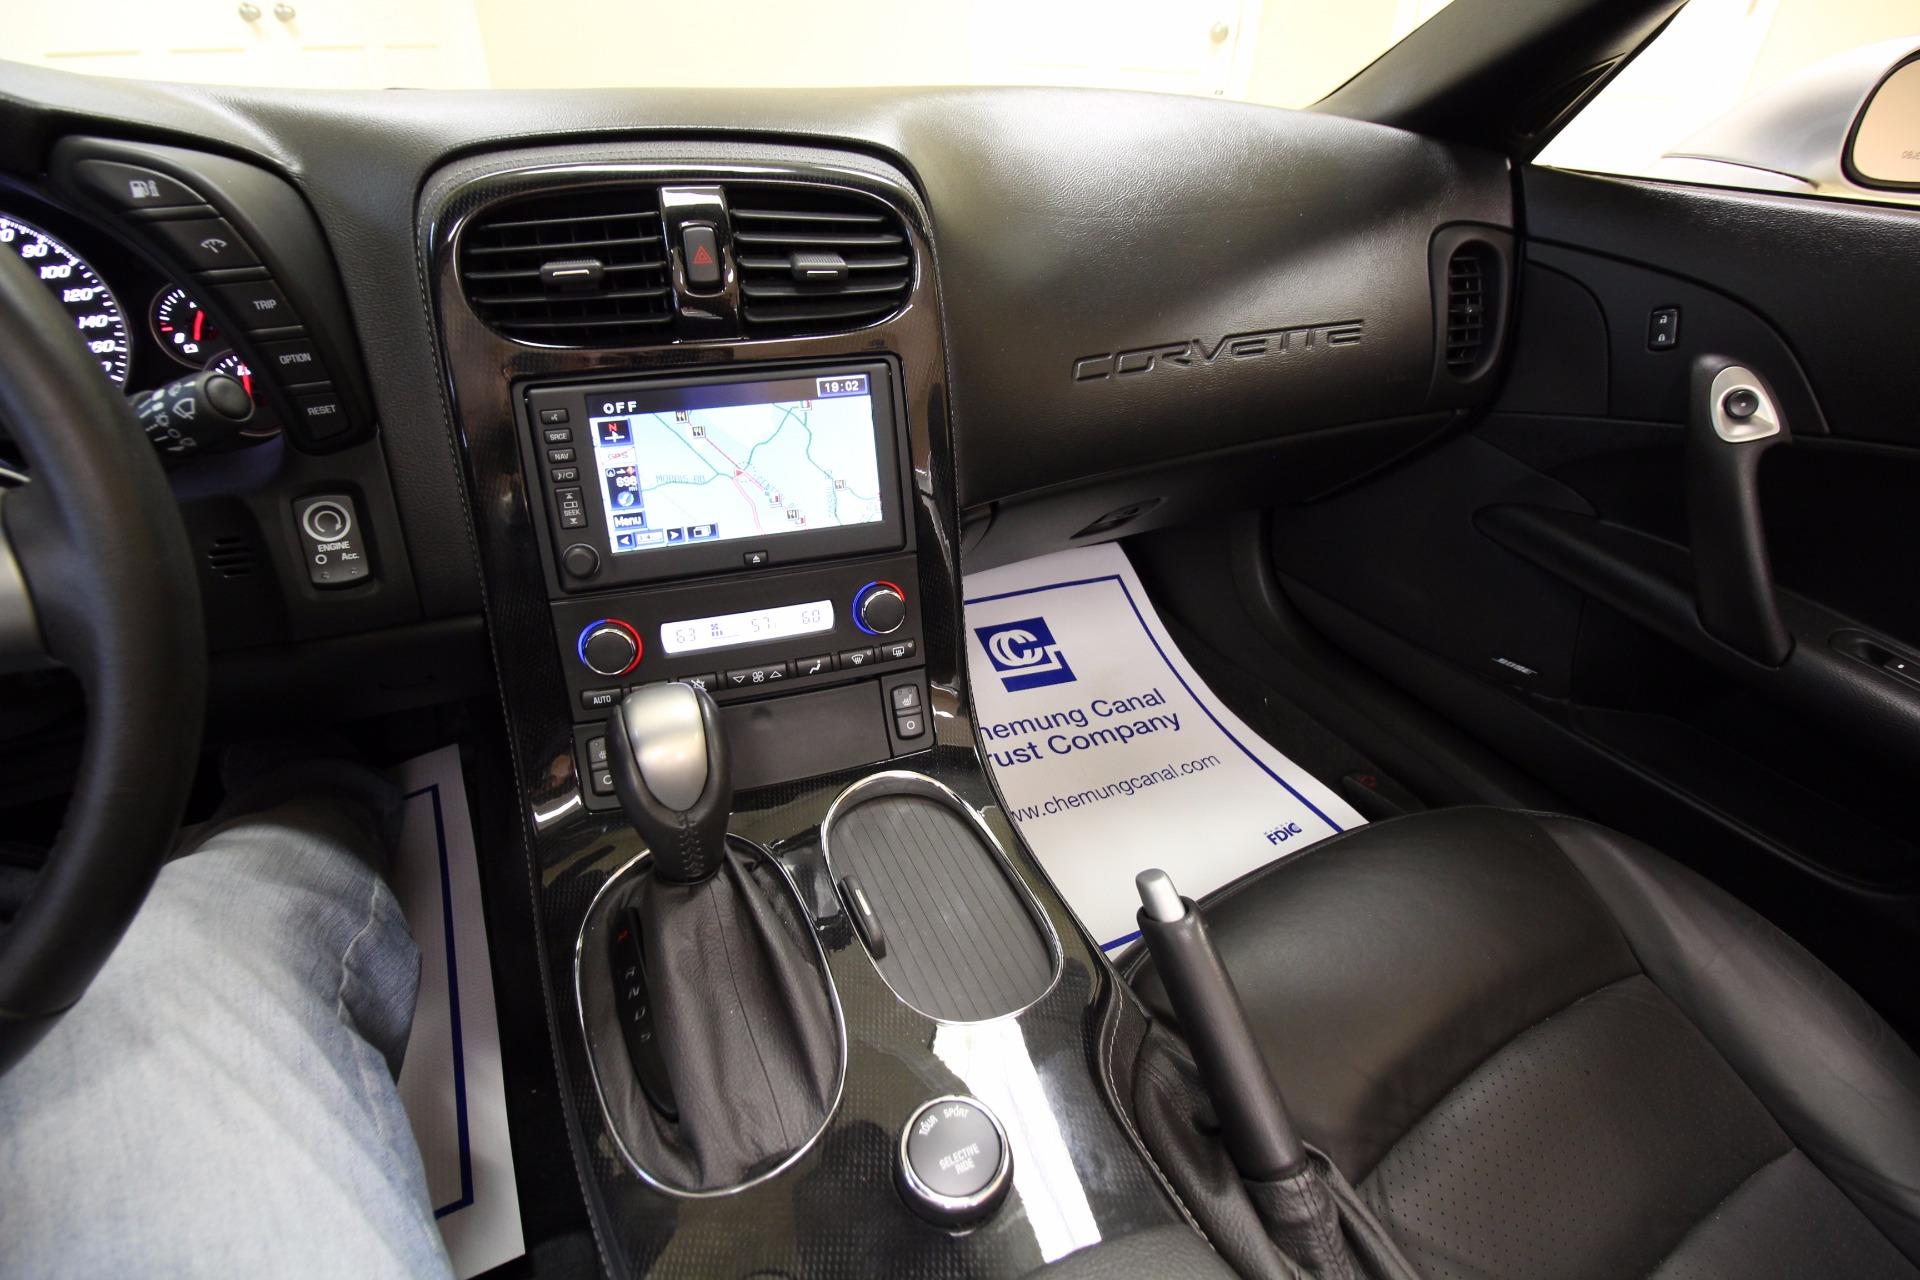 Used 2008 Chevrolet Corvette Convertible LT2 | Albany, NY